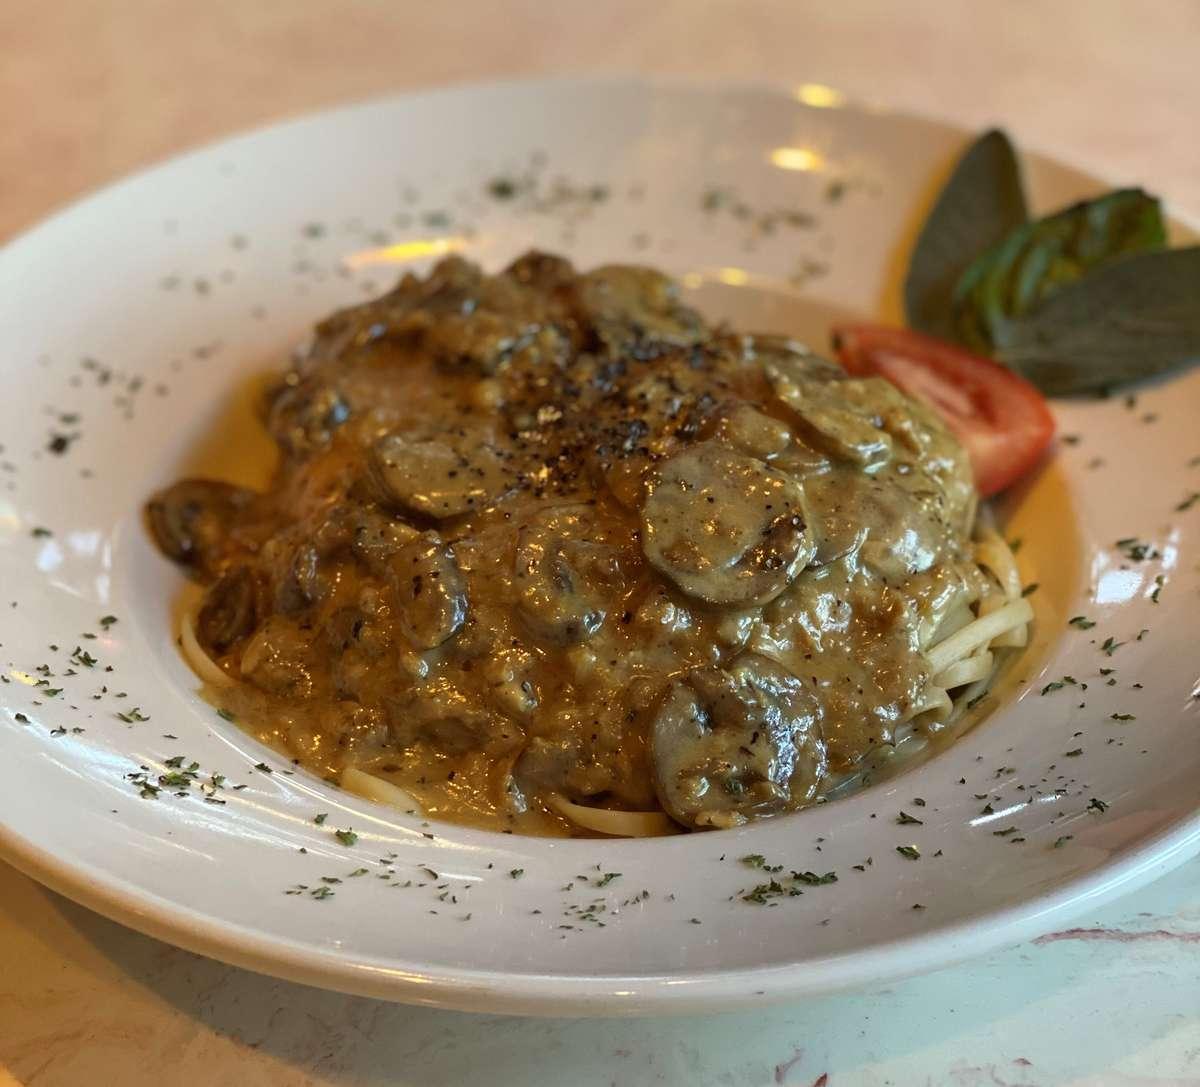 Monday: Chicken Marsala